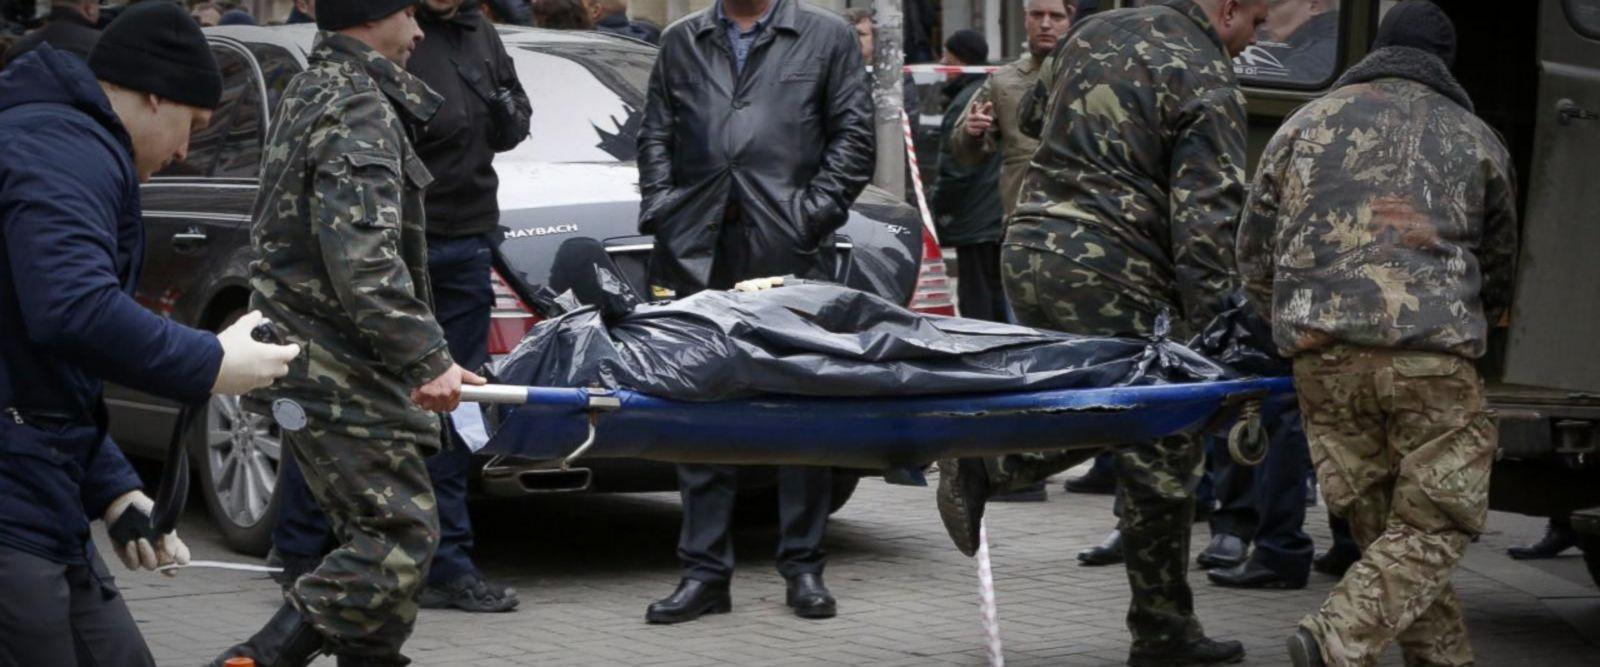 VIDEO: Putin critic who defected to Ukraine killed in Kiev